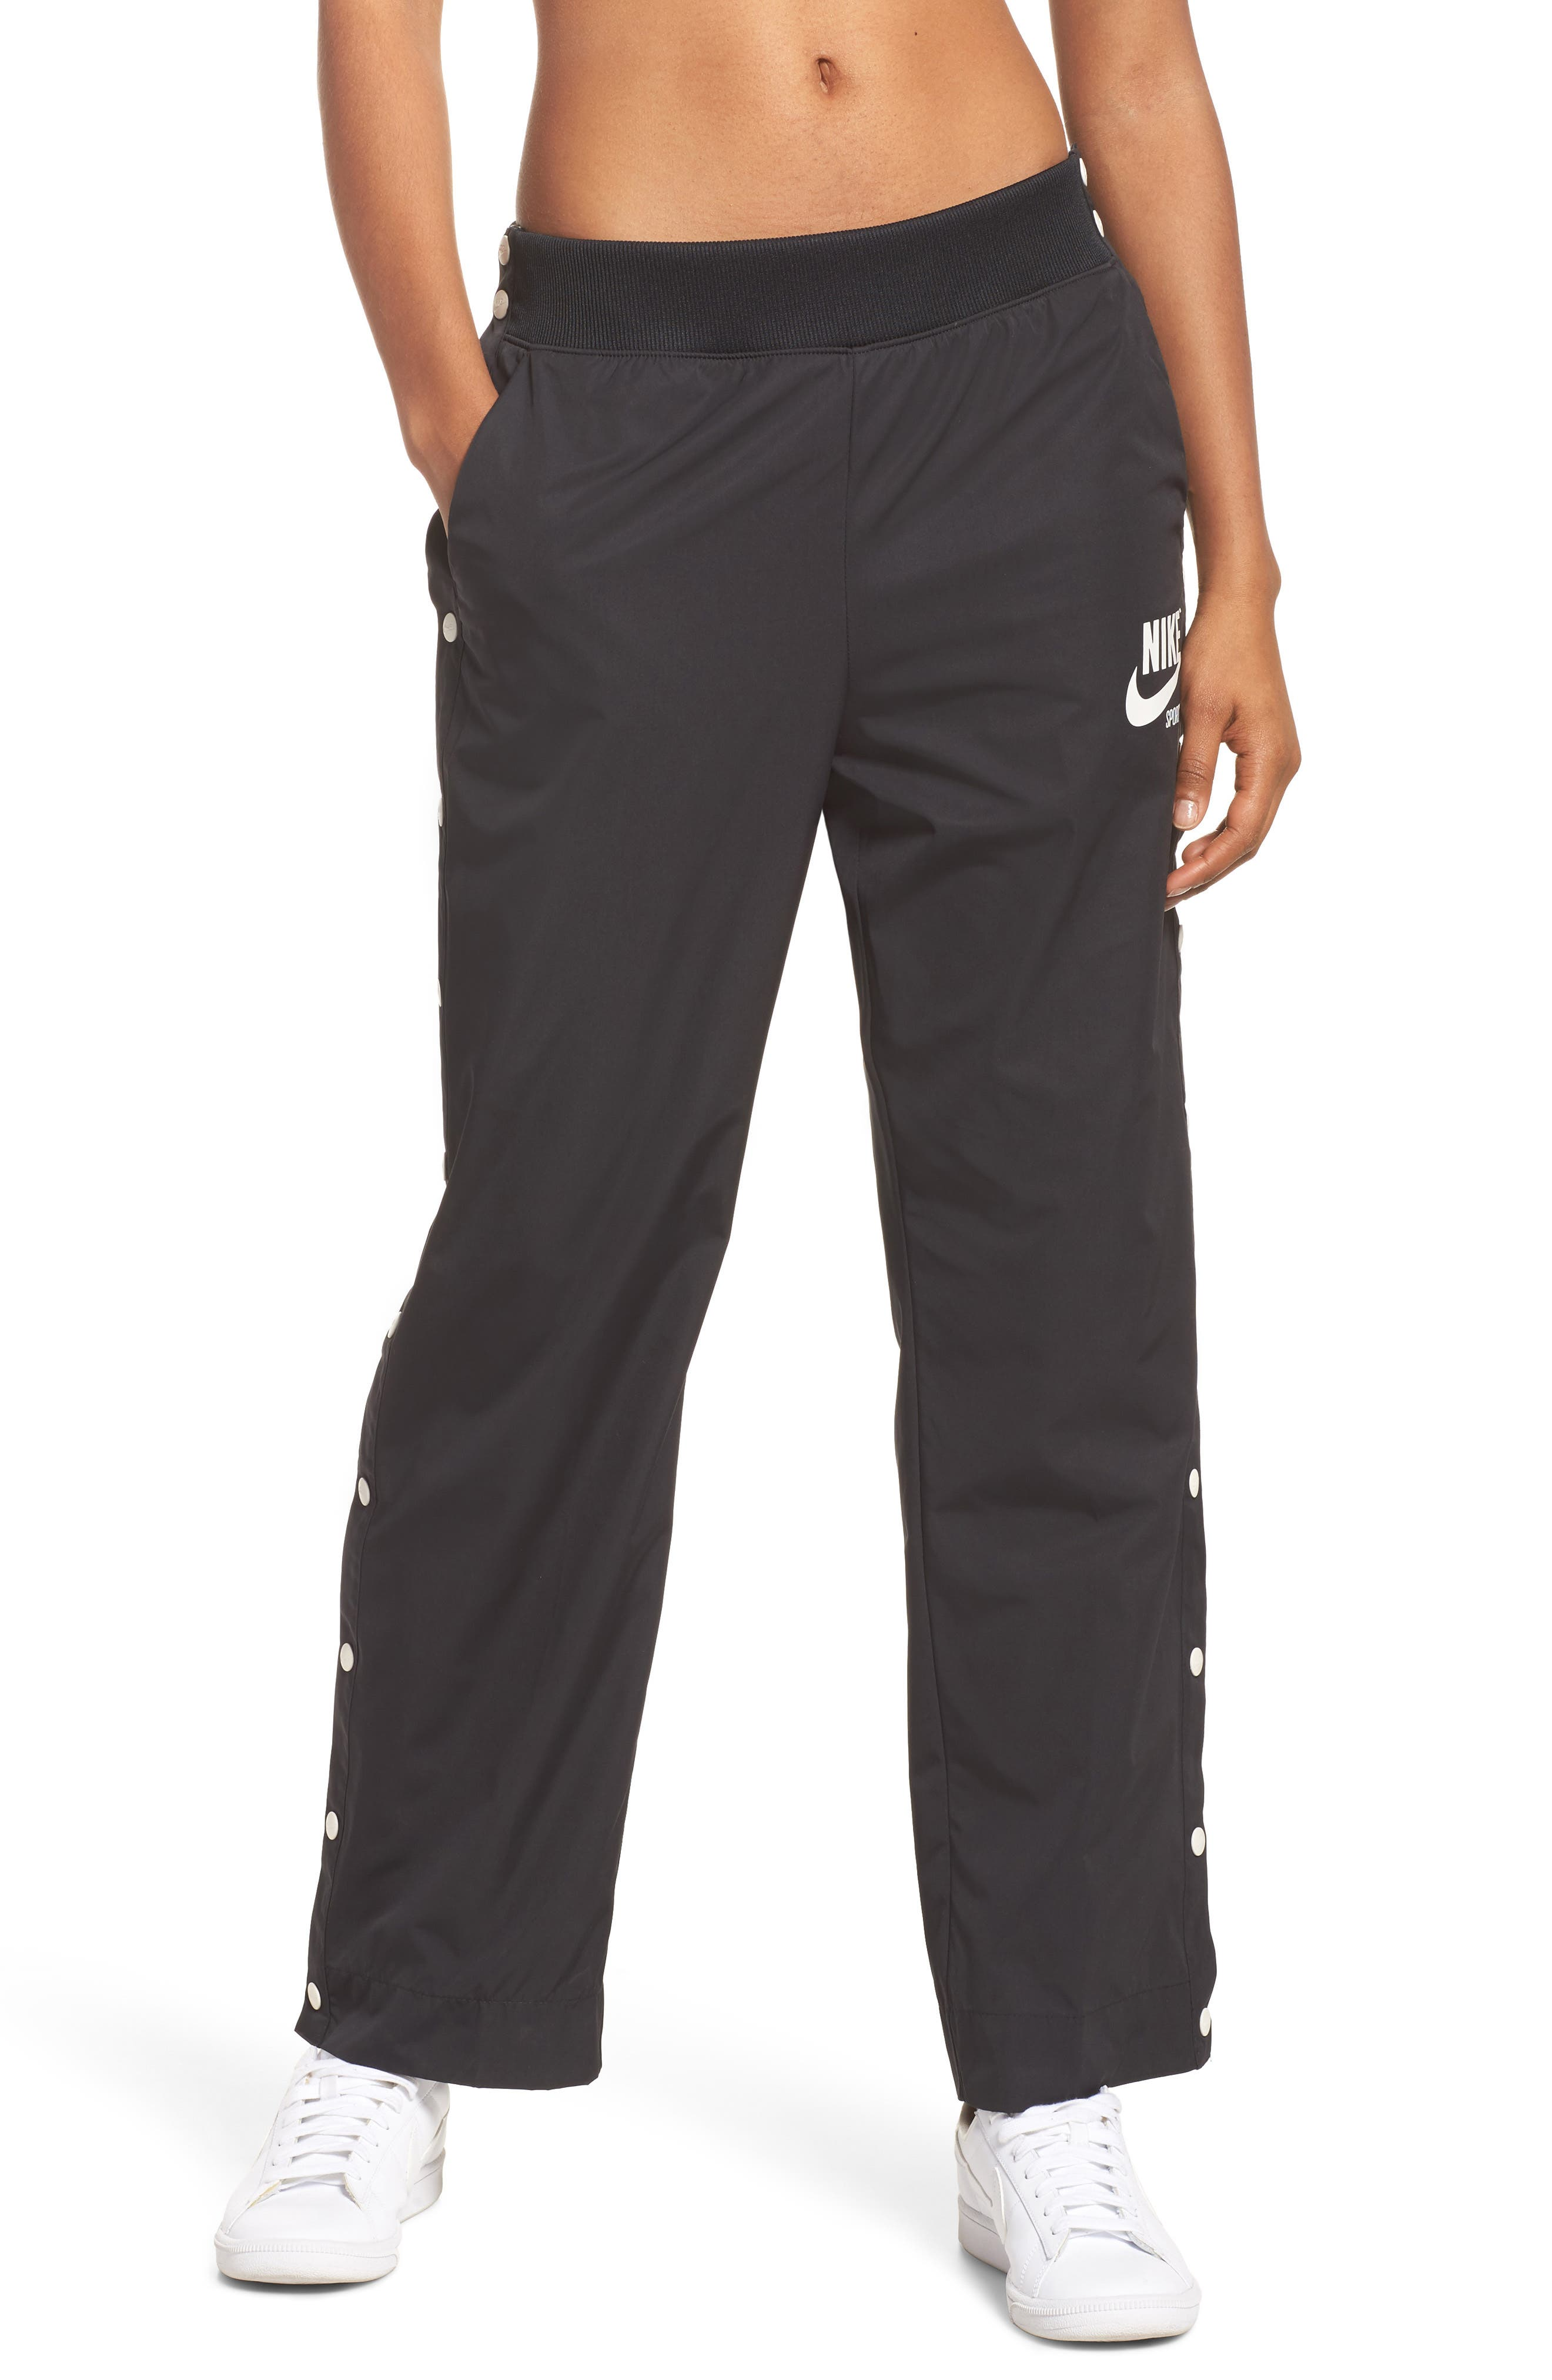 Sportswear Archive Snap Track Pants,                         Main,                         color, Black/ Sail